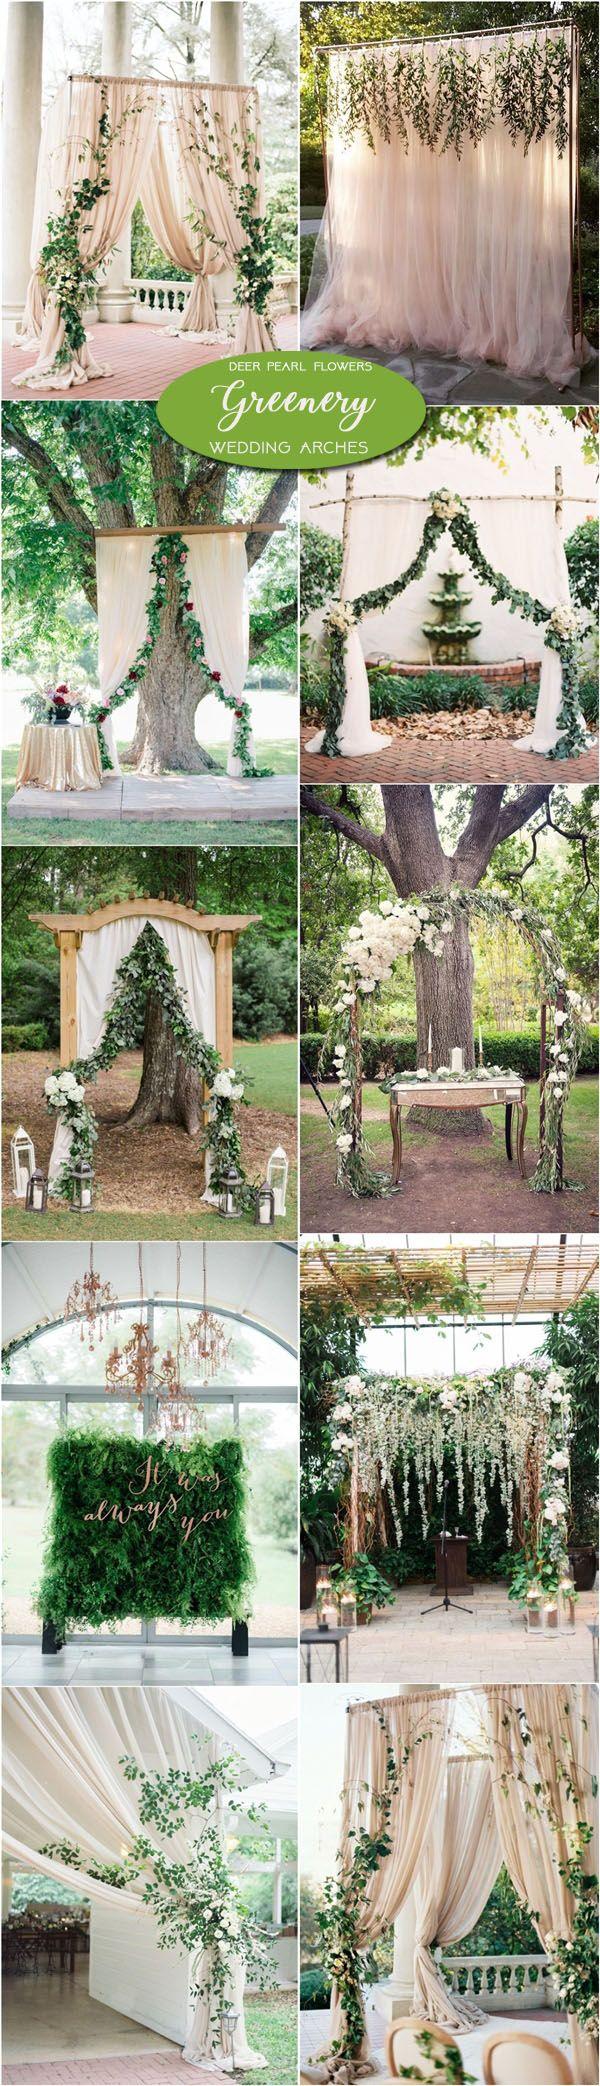 Alter Decorations Wedding Neutral Greenery Wedding Arch And Alter Ideas Wwwdeerpearlflow